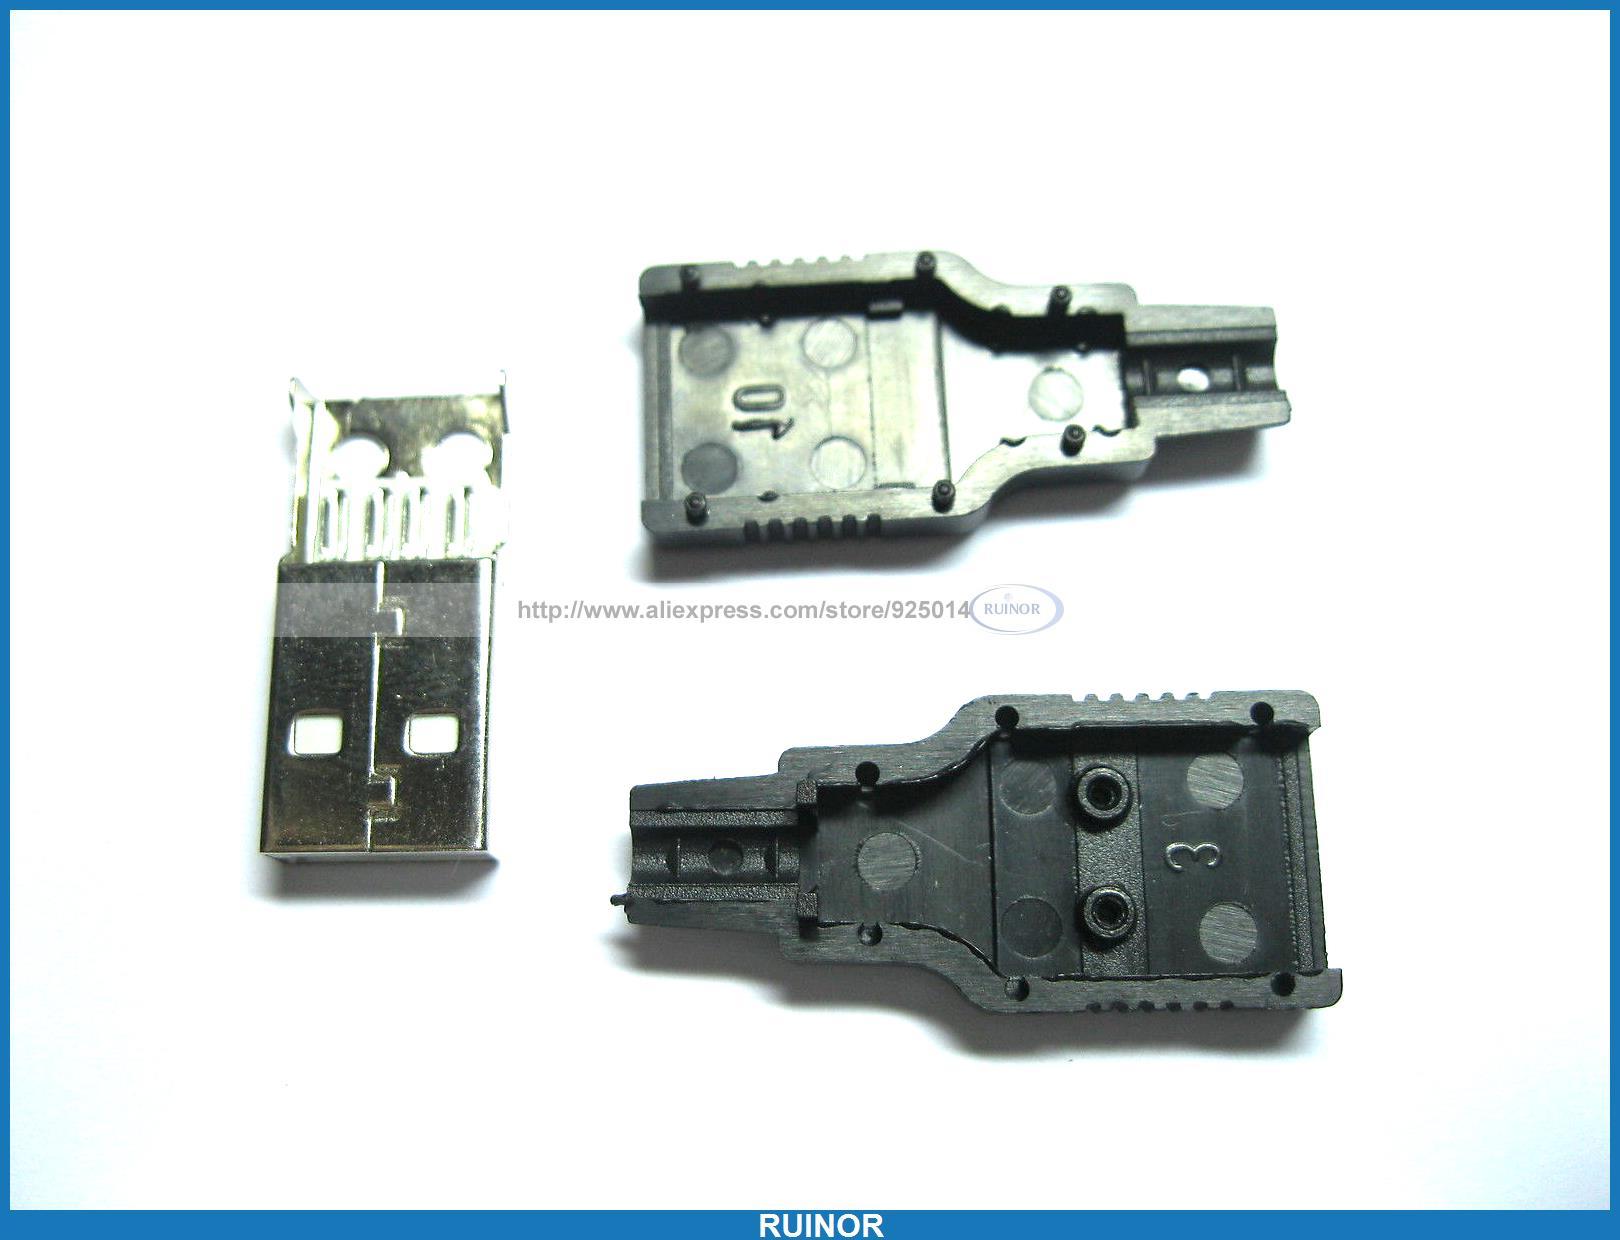 200 Pcs A M Solder 3 Piece 4 Pin USB Male Plug Connector Black Plasitc Cover mylb 10pcs type a male usb 4 pin plug socket connector with black plastic cover